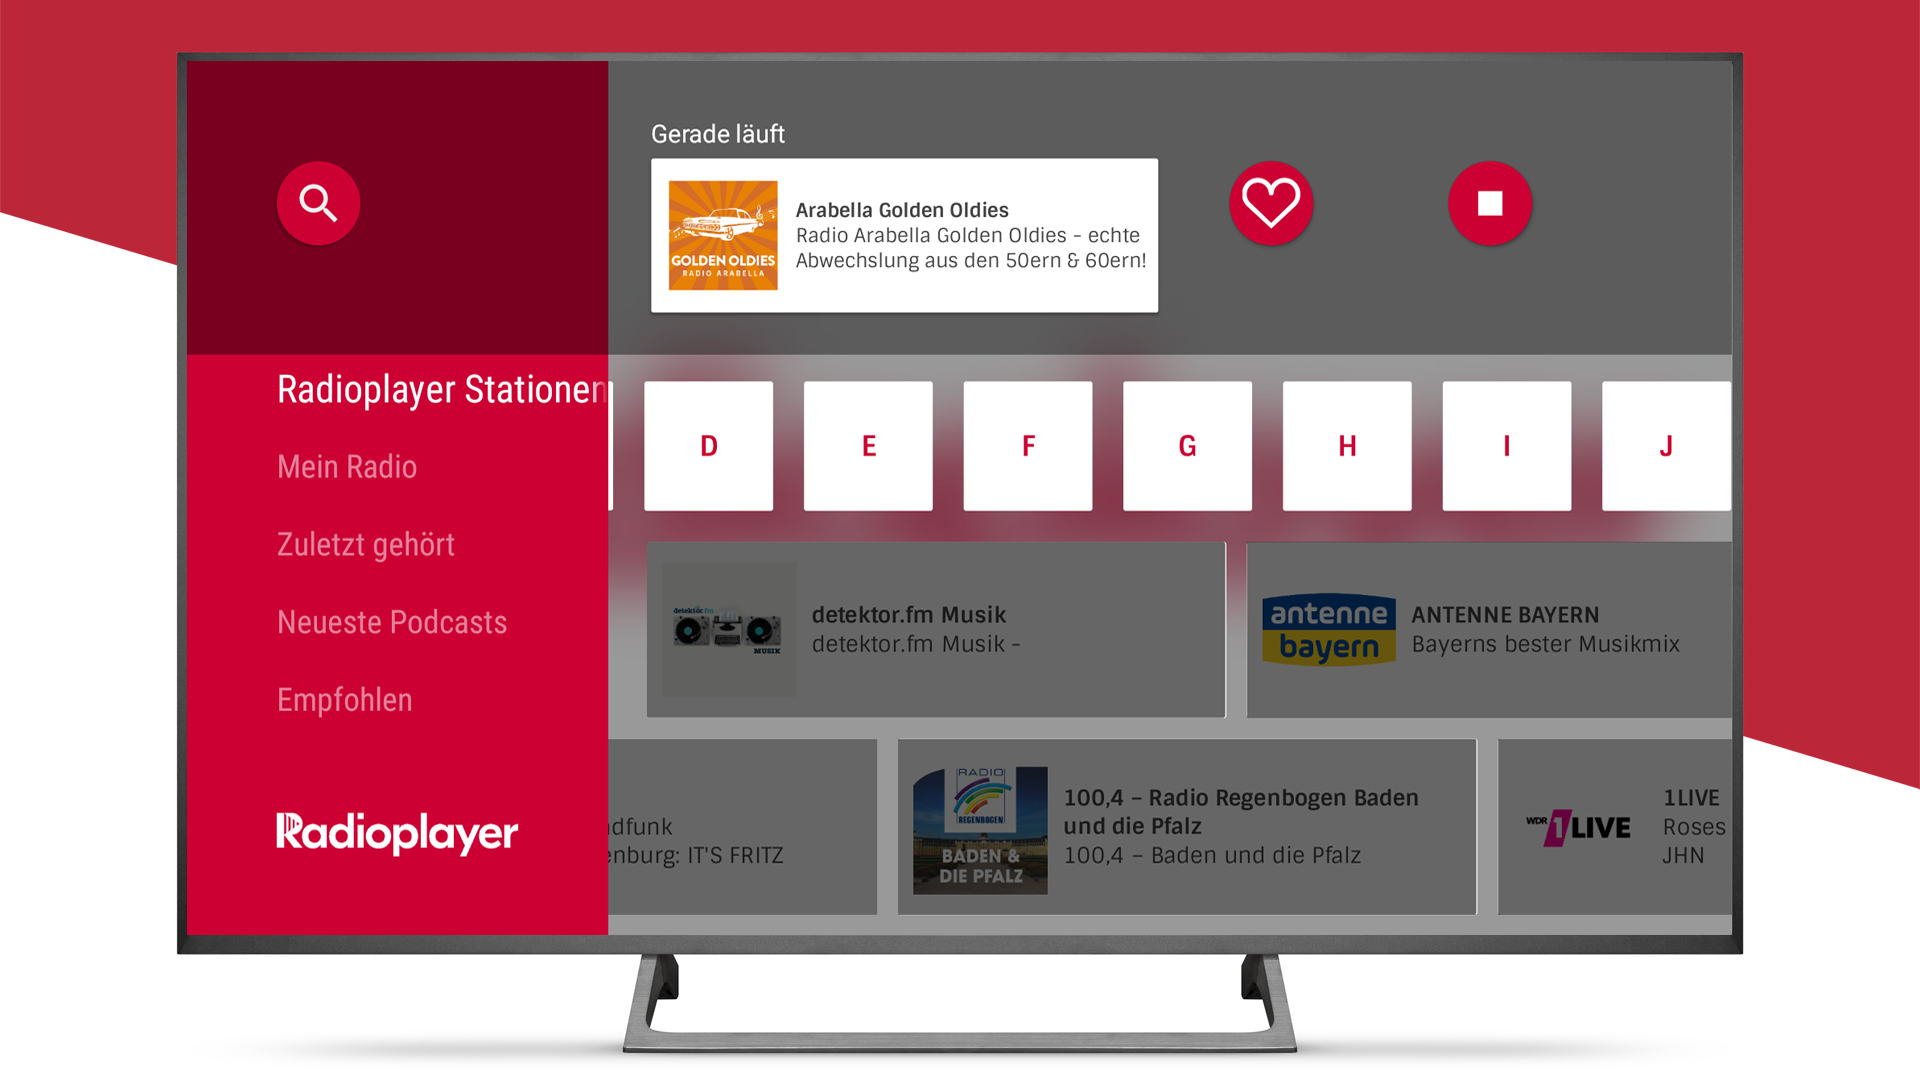 Radioplayer - Free German Radio App: Amazon.es: Appstore para Android